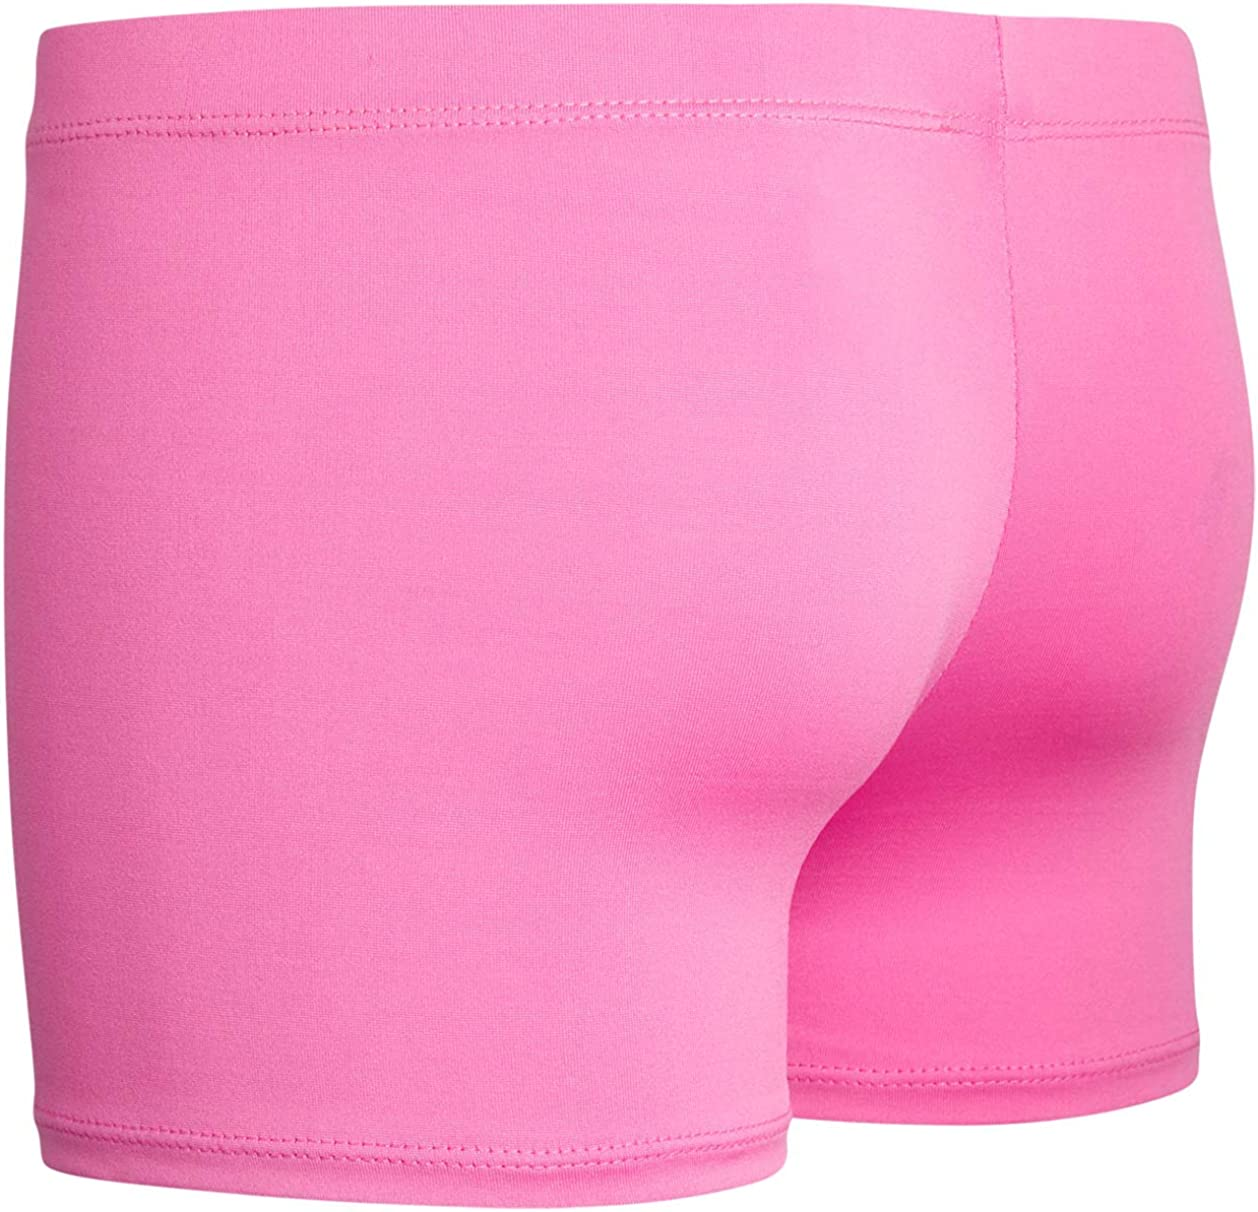 Sweet Princess Girls Under Dress and Skirts Modesty Shorts 4-Pack